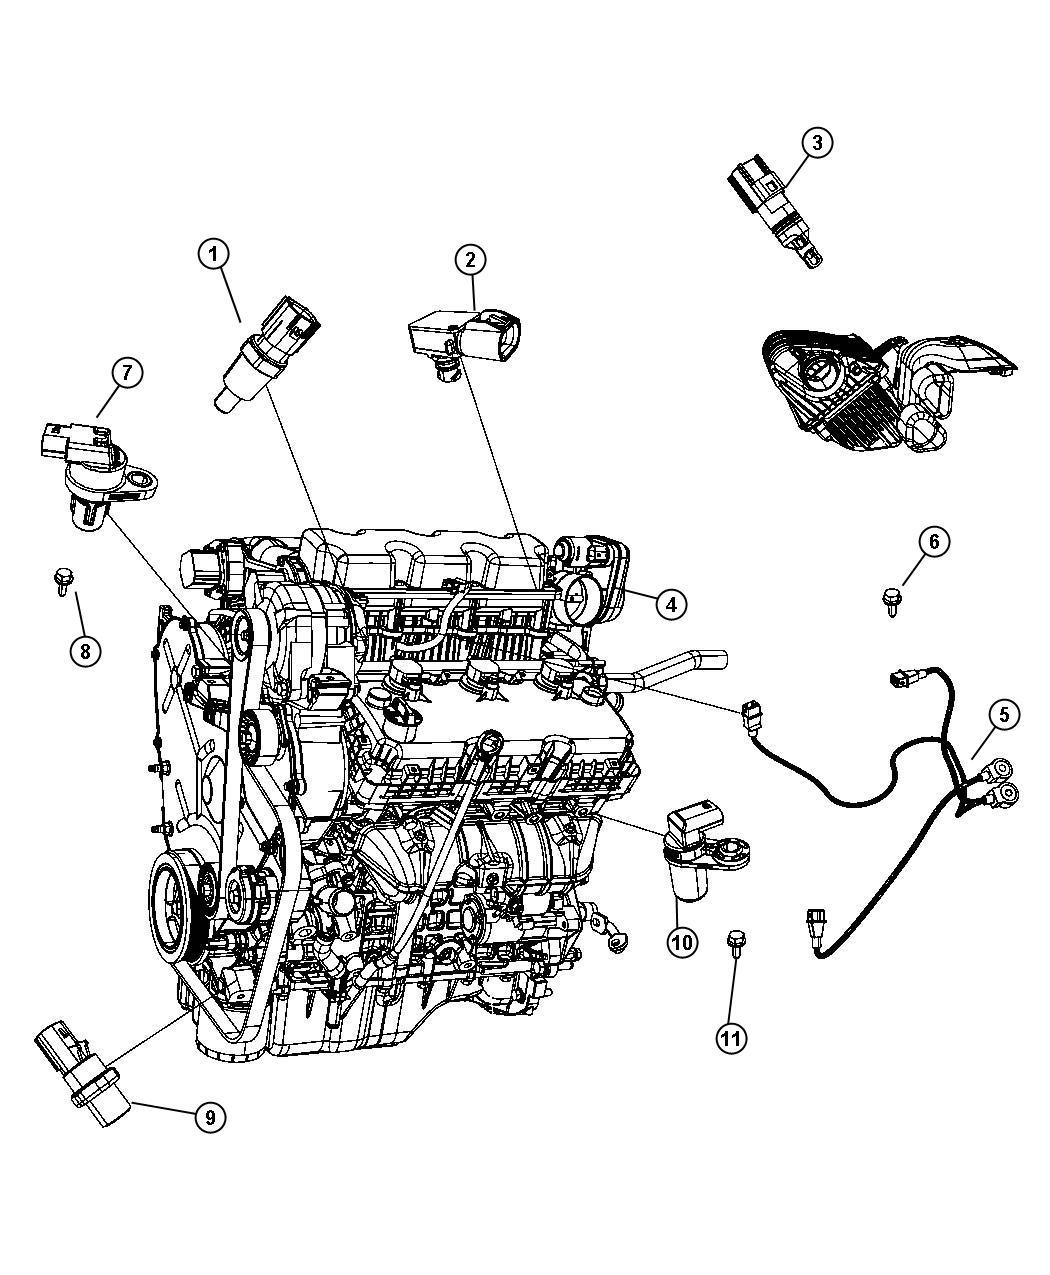 94 vw jetta parts diagram 2000 ford ranger engine 2004 volkswagen air conditioning